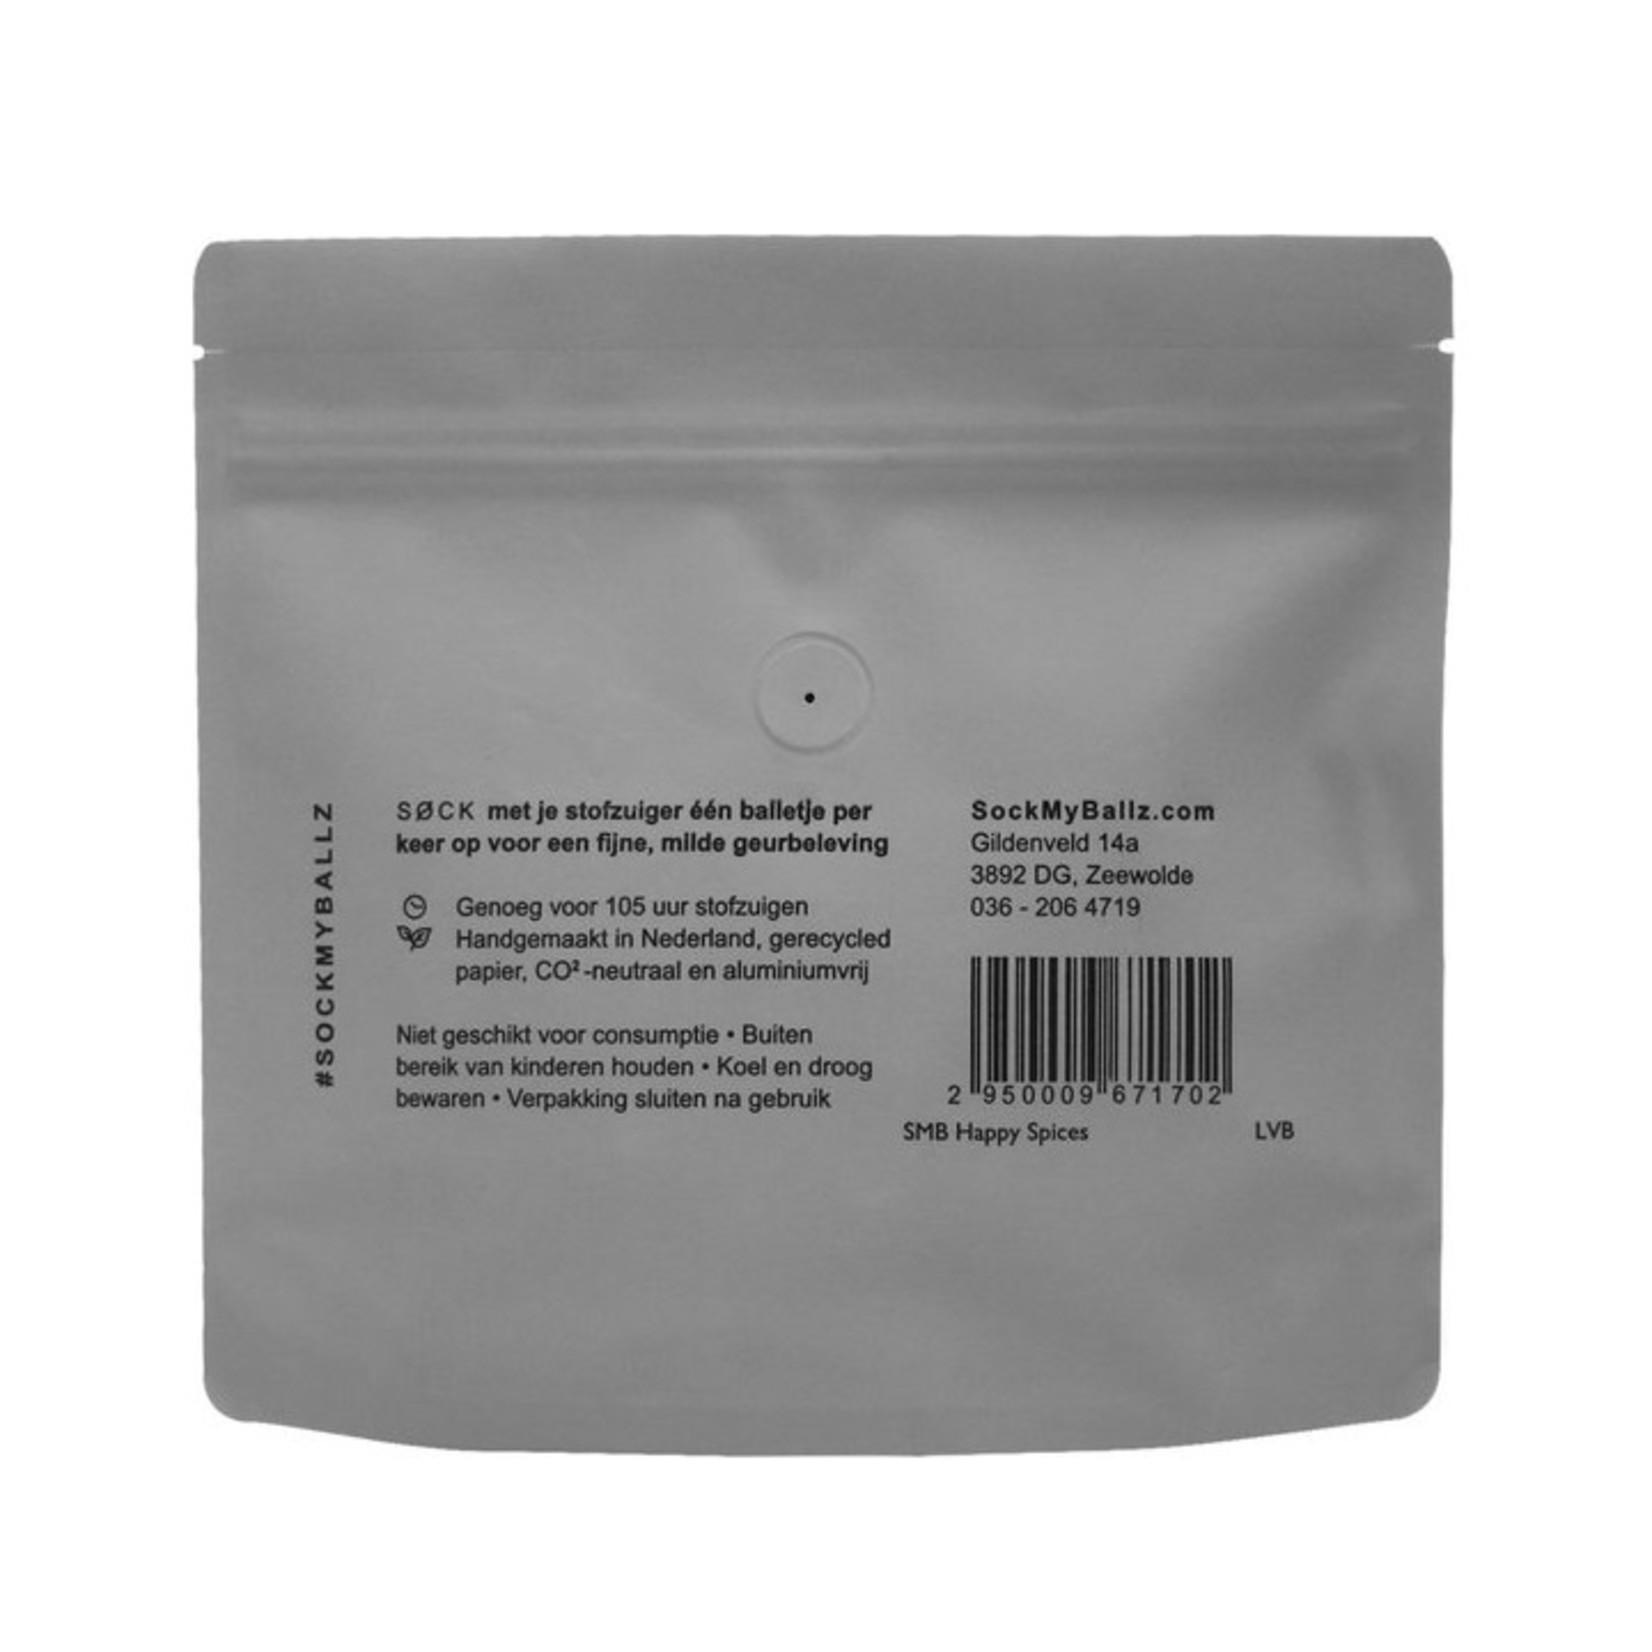 SockMyBallz 30 Stofzuigerballen - Happy Spices